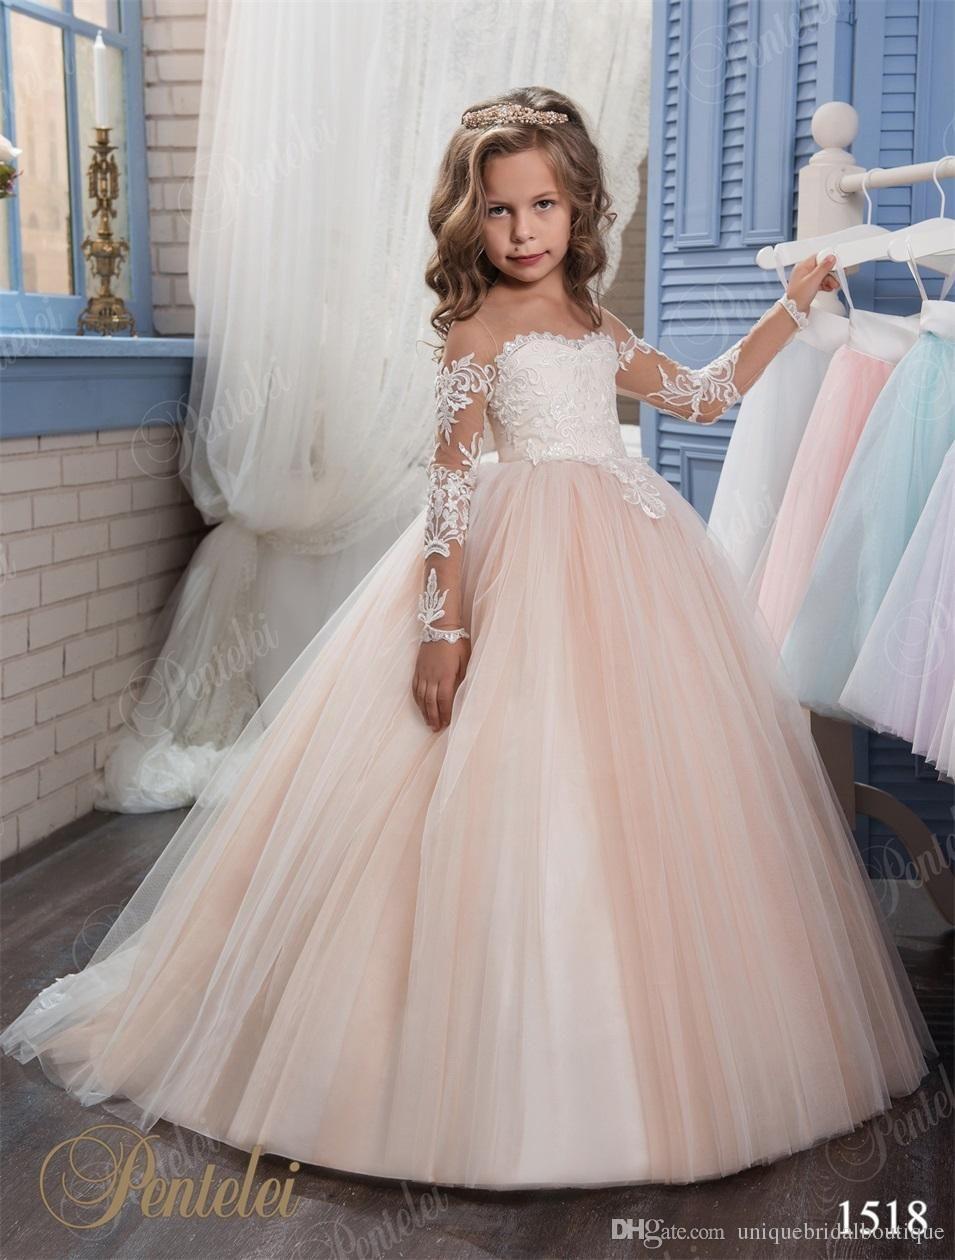 Little Girl Wedding Dress